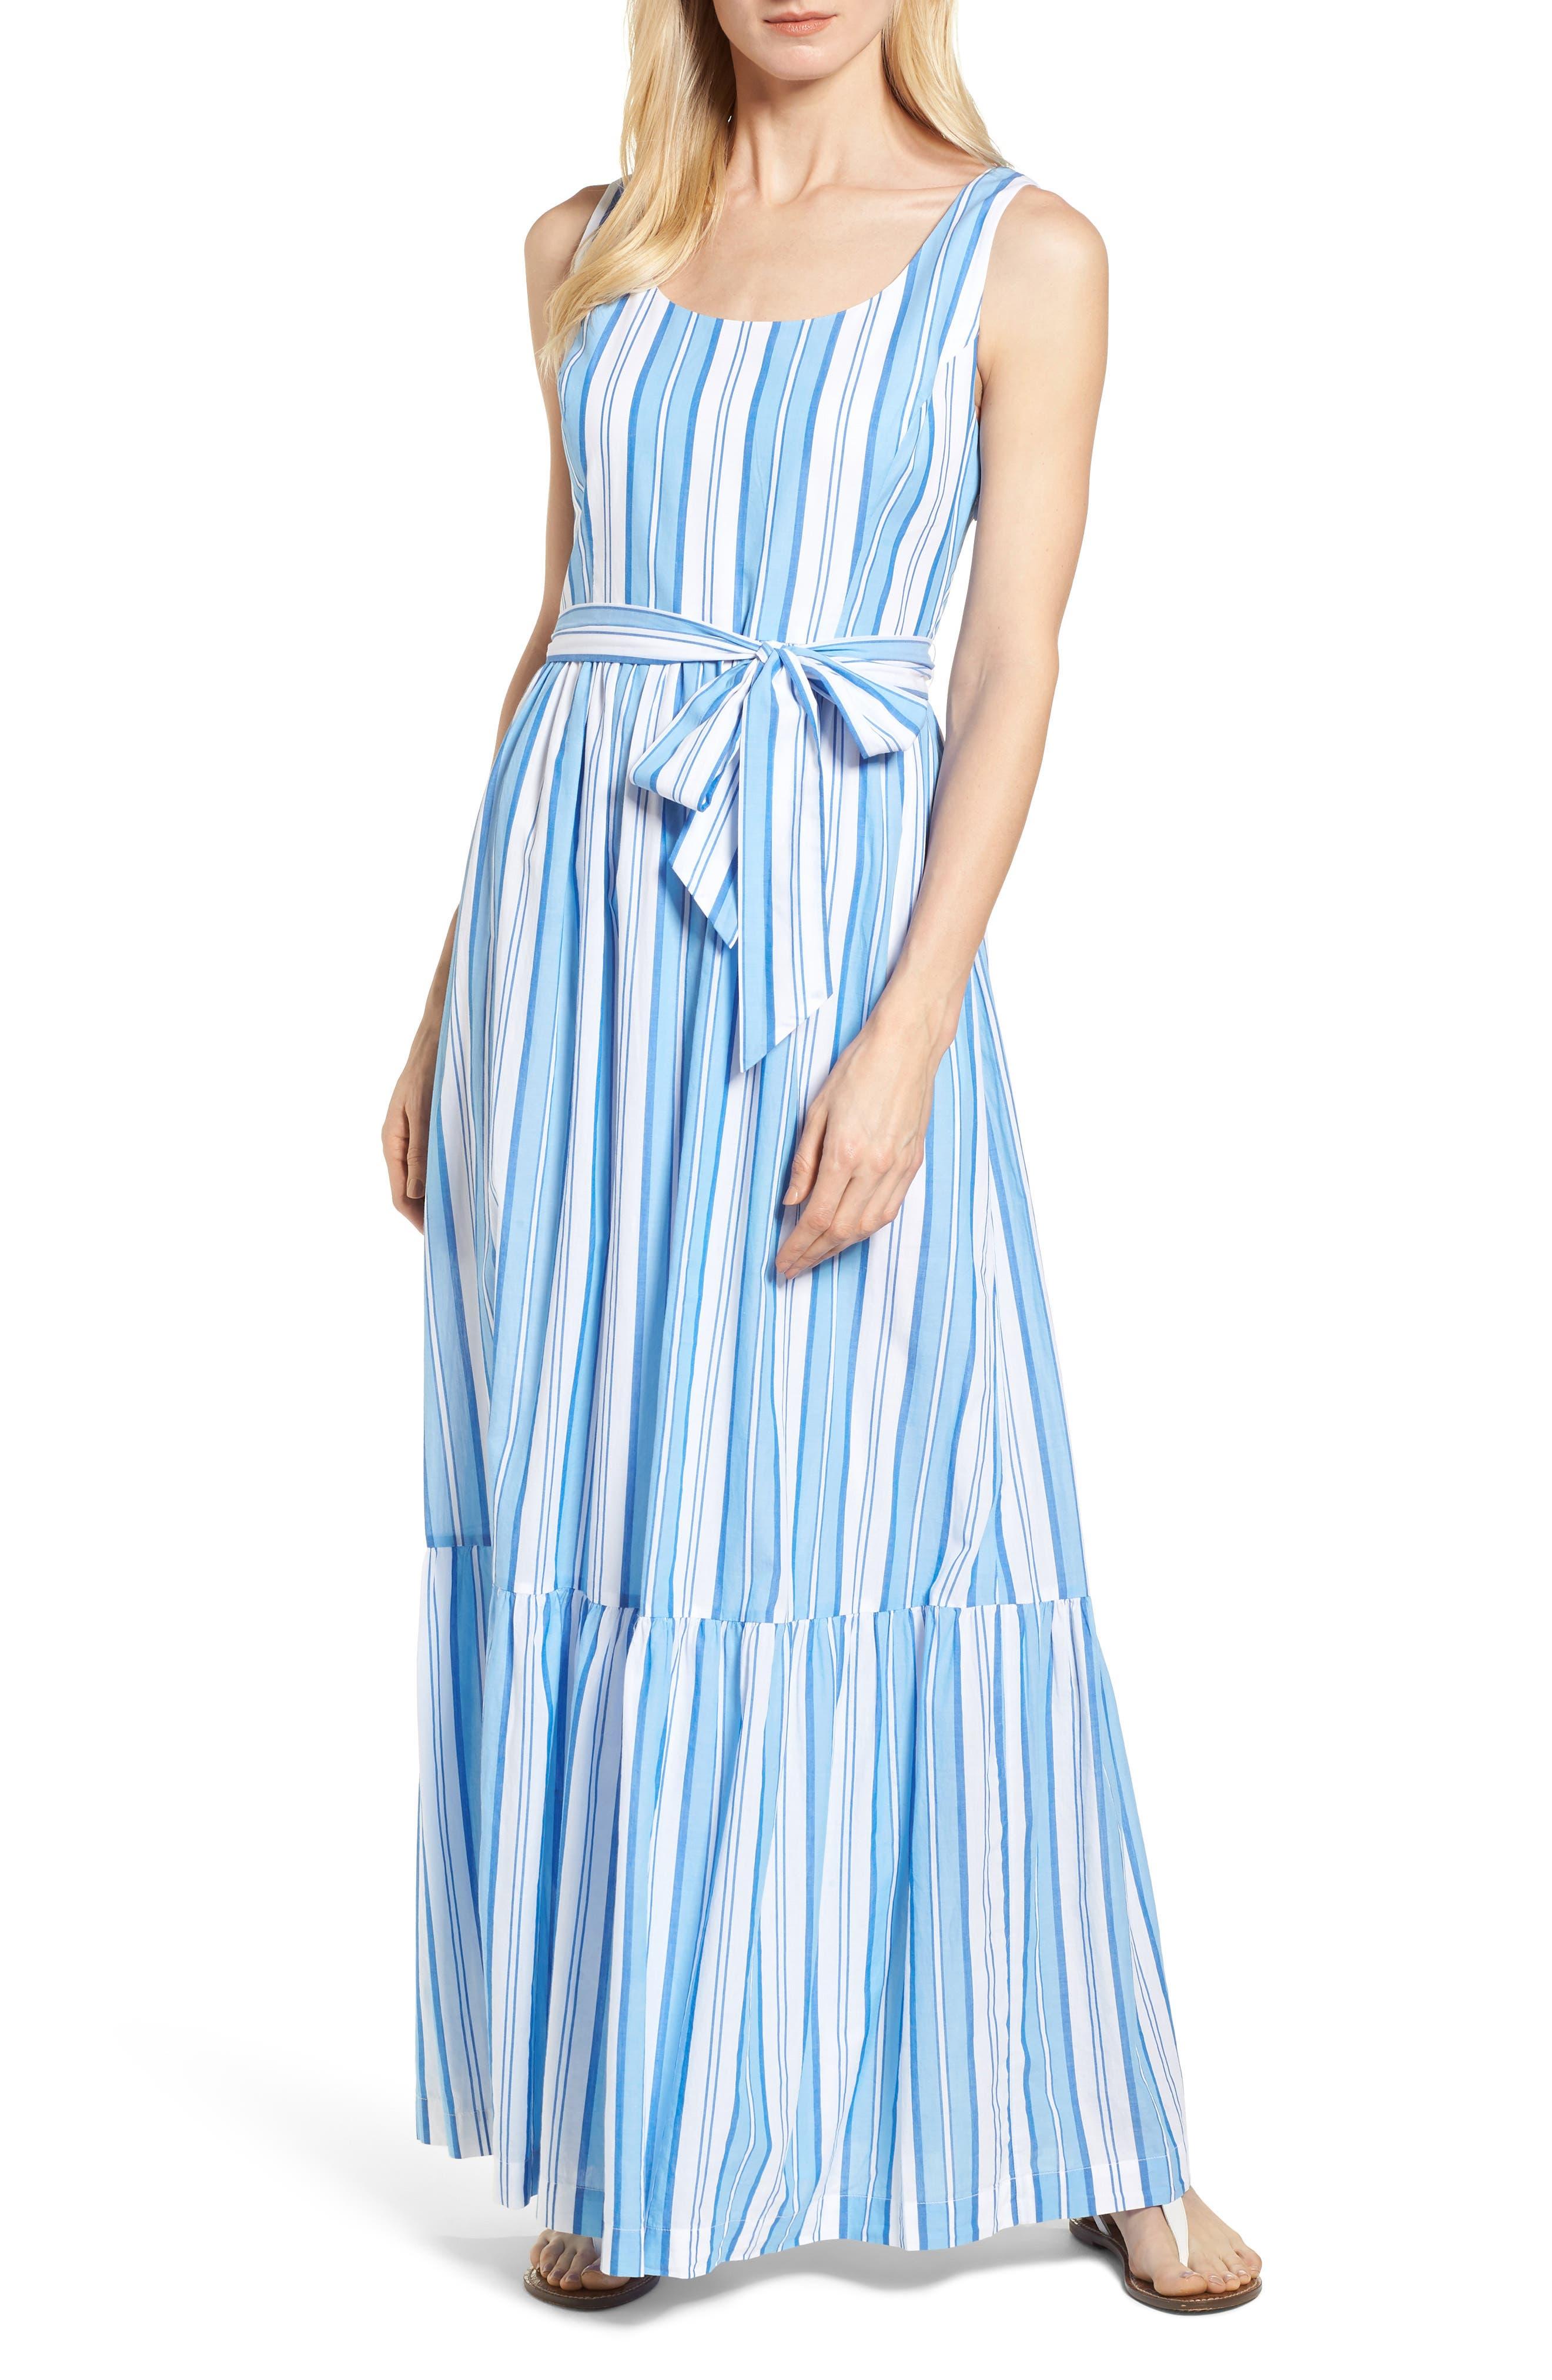 Vineyard Vines Ocean Stripe Tiered Maxi Dress